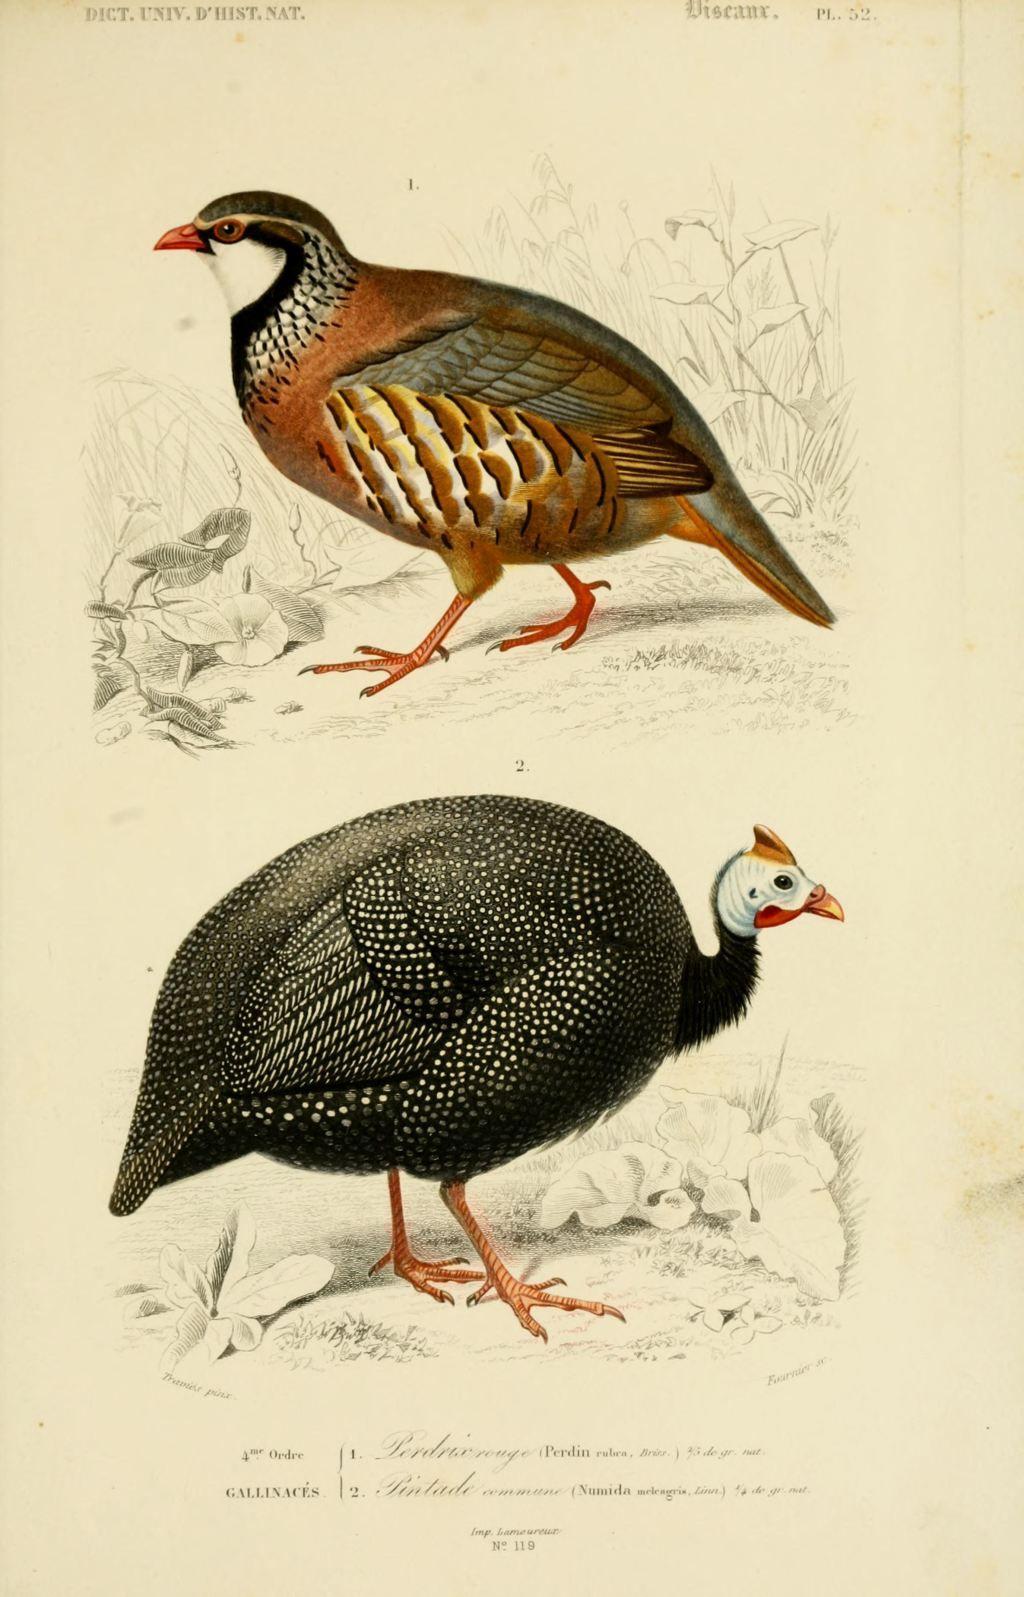 Gravures couleur d 39 oiseaux gravure oiseau 0267 pintade commune numida meleagris gallinace - Dessin pintade ...